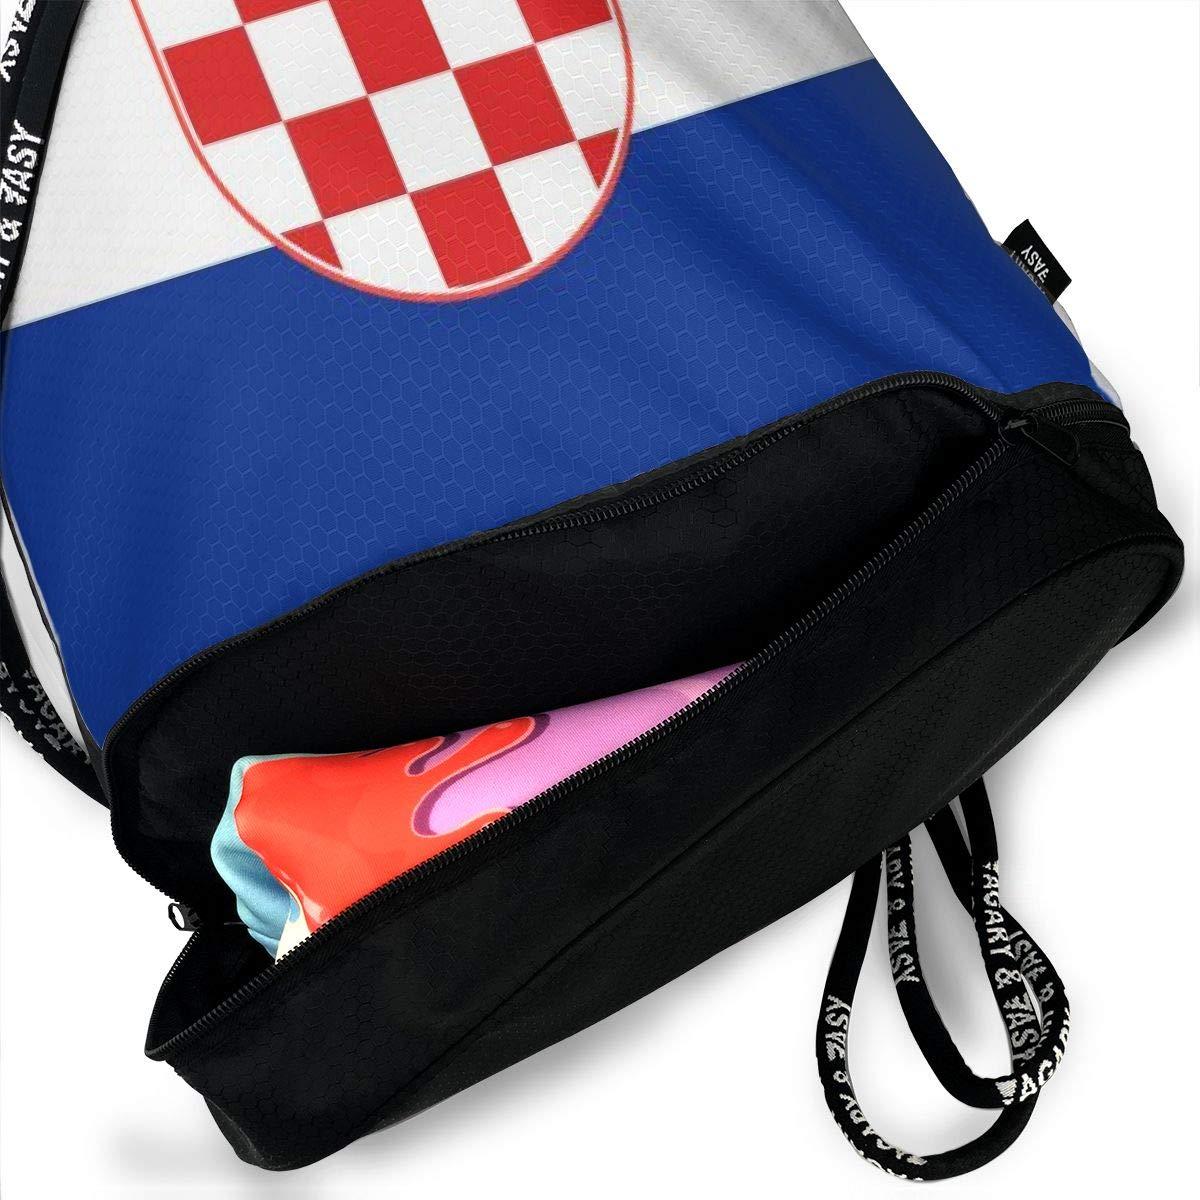 Lightweight Waterproof Large Storage Drawstring Bag For Men /& Women Croatia Flag Cinch Backpack Sackpack Tote Sack